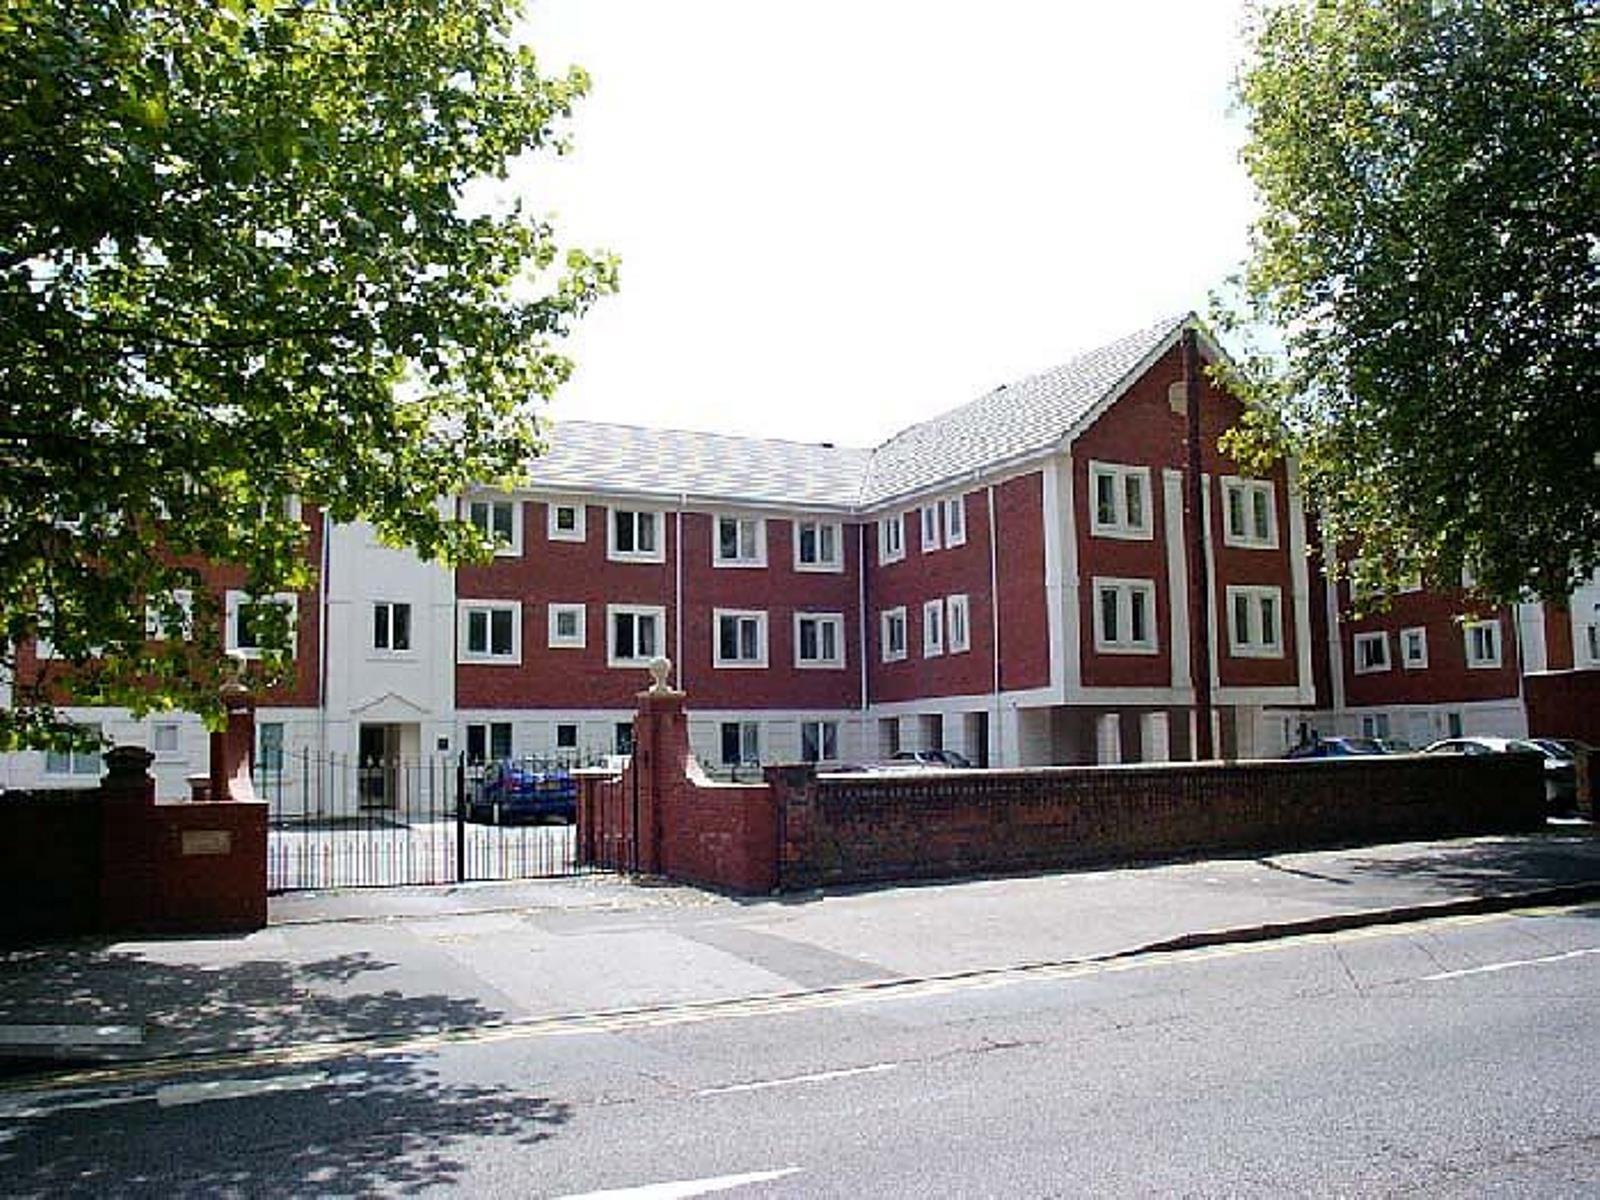 Shelley Court, Reading, RG1 5DG